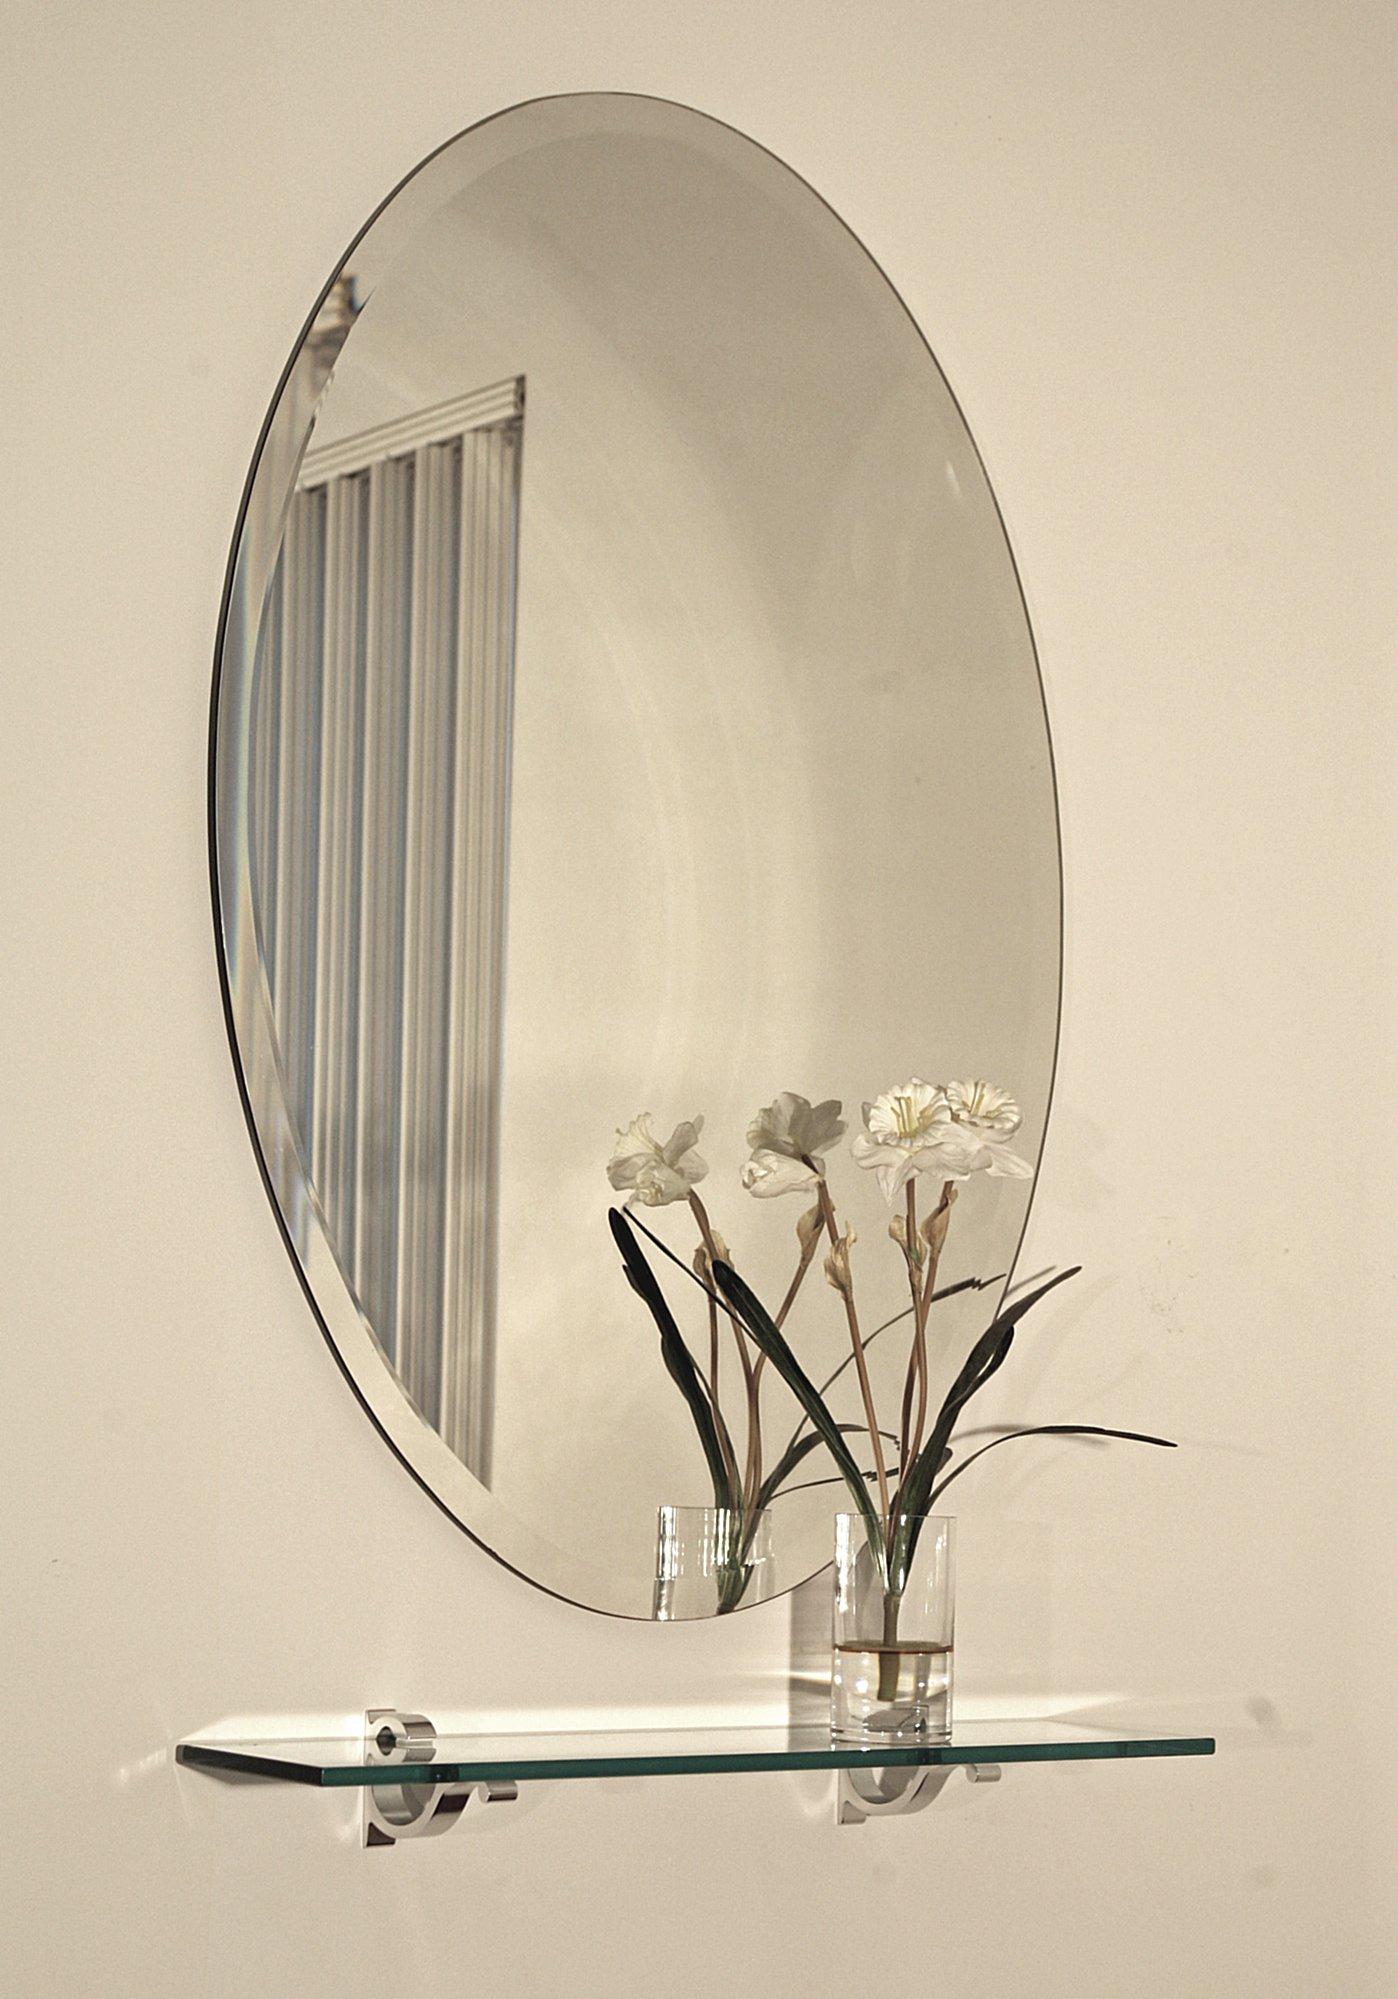 24'' X 36'' Oval Frameless Bevel Wall Mirror